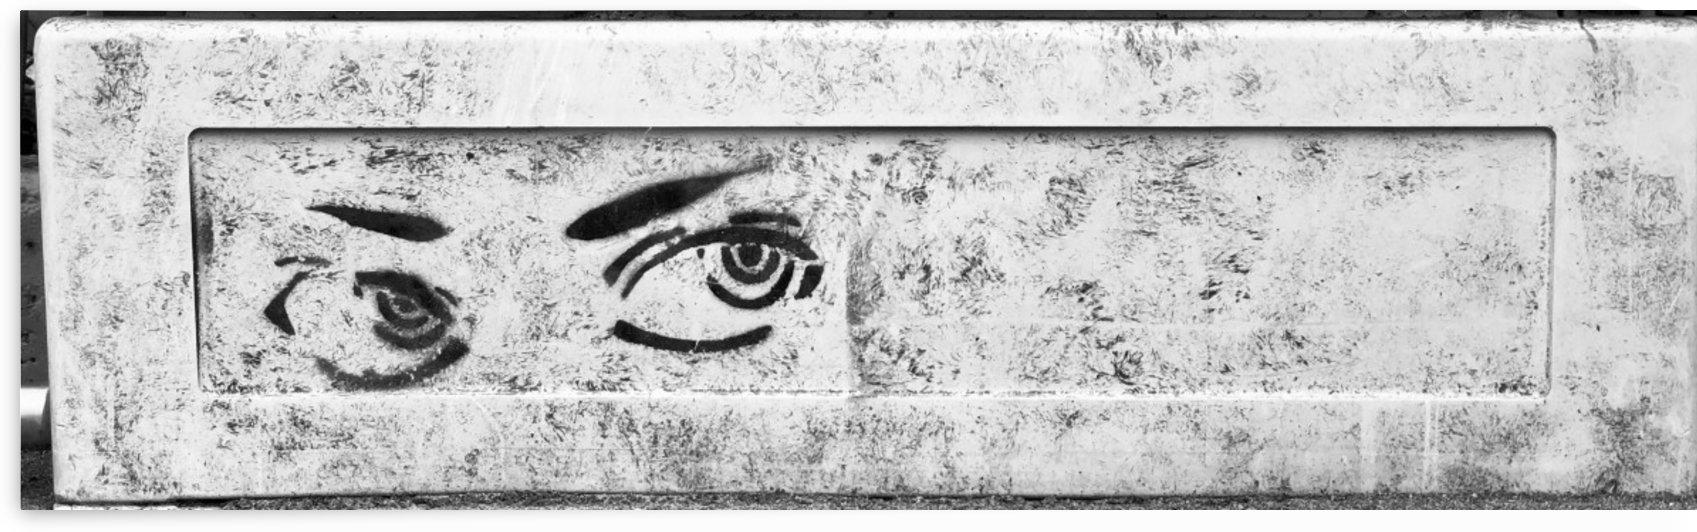 Street Graffiti Two Eyes Watching You by Swiss Art by Patrick Kobler